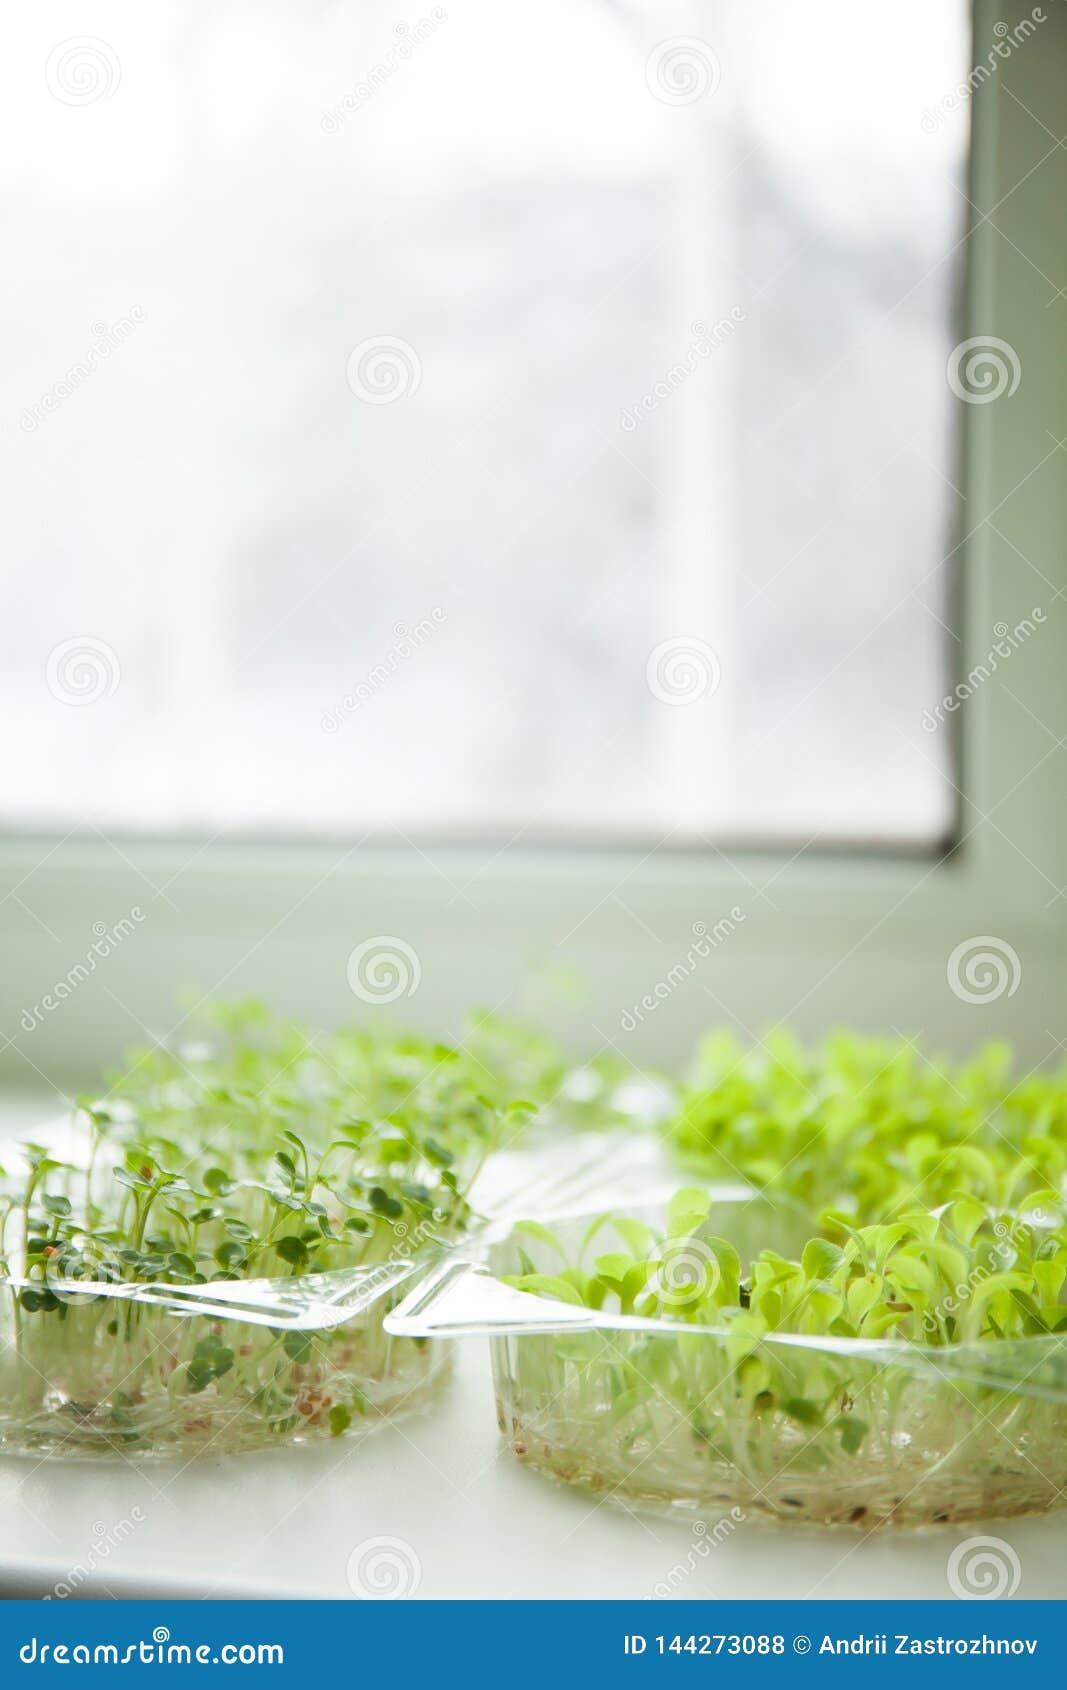 Groeiende micro- greens op de vensterbank van het huis